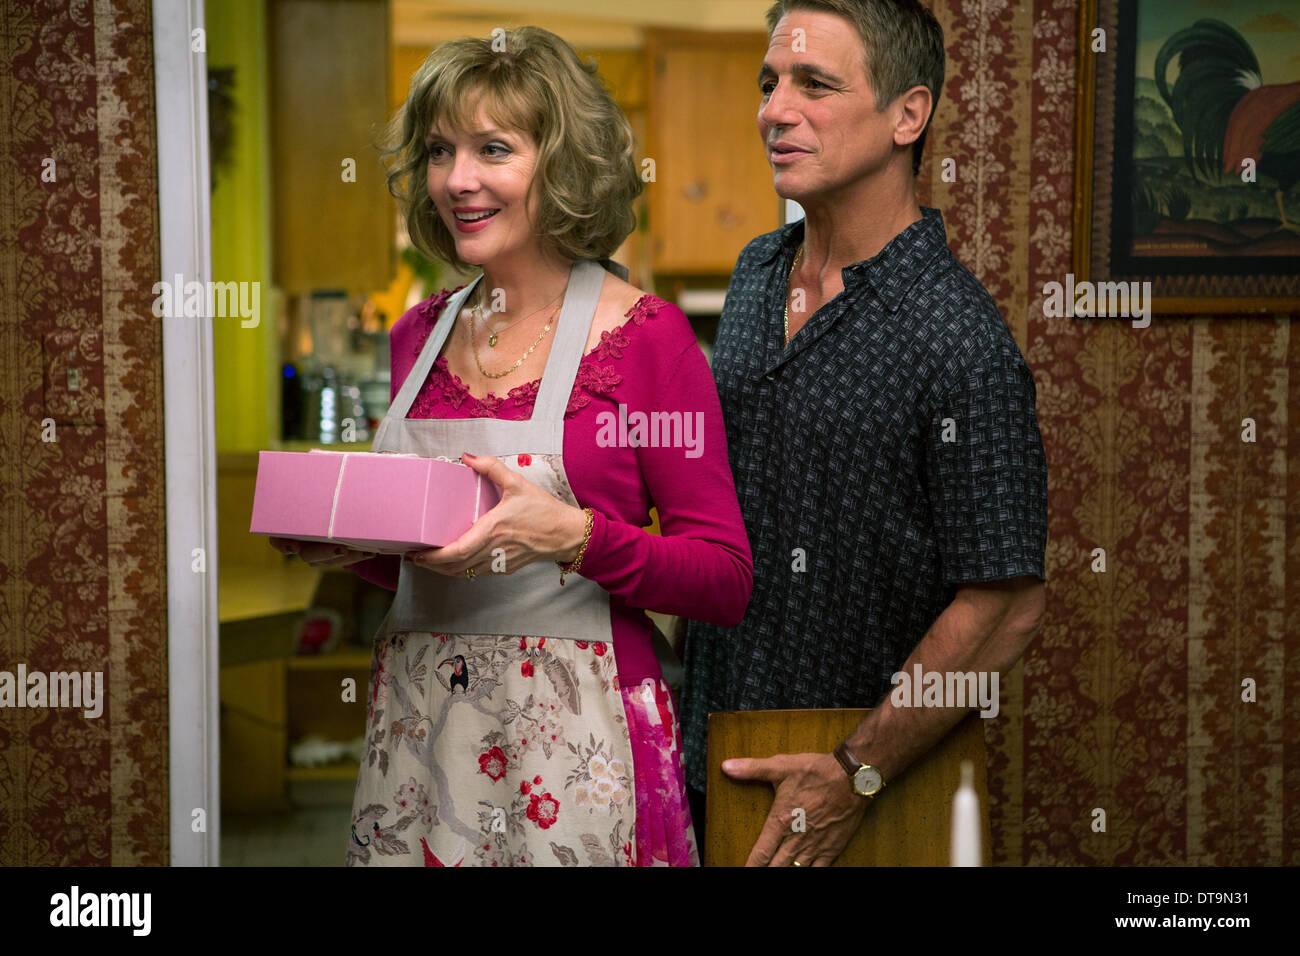 GLENNE HEADLY & Tony Danza DON JON (2013) Imagen De Stock